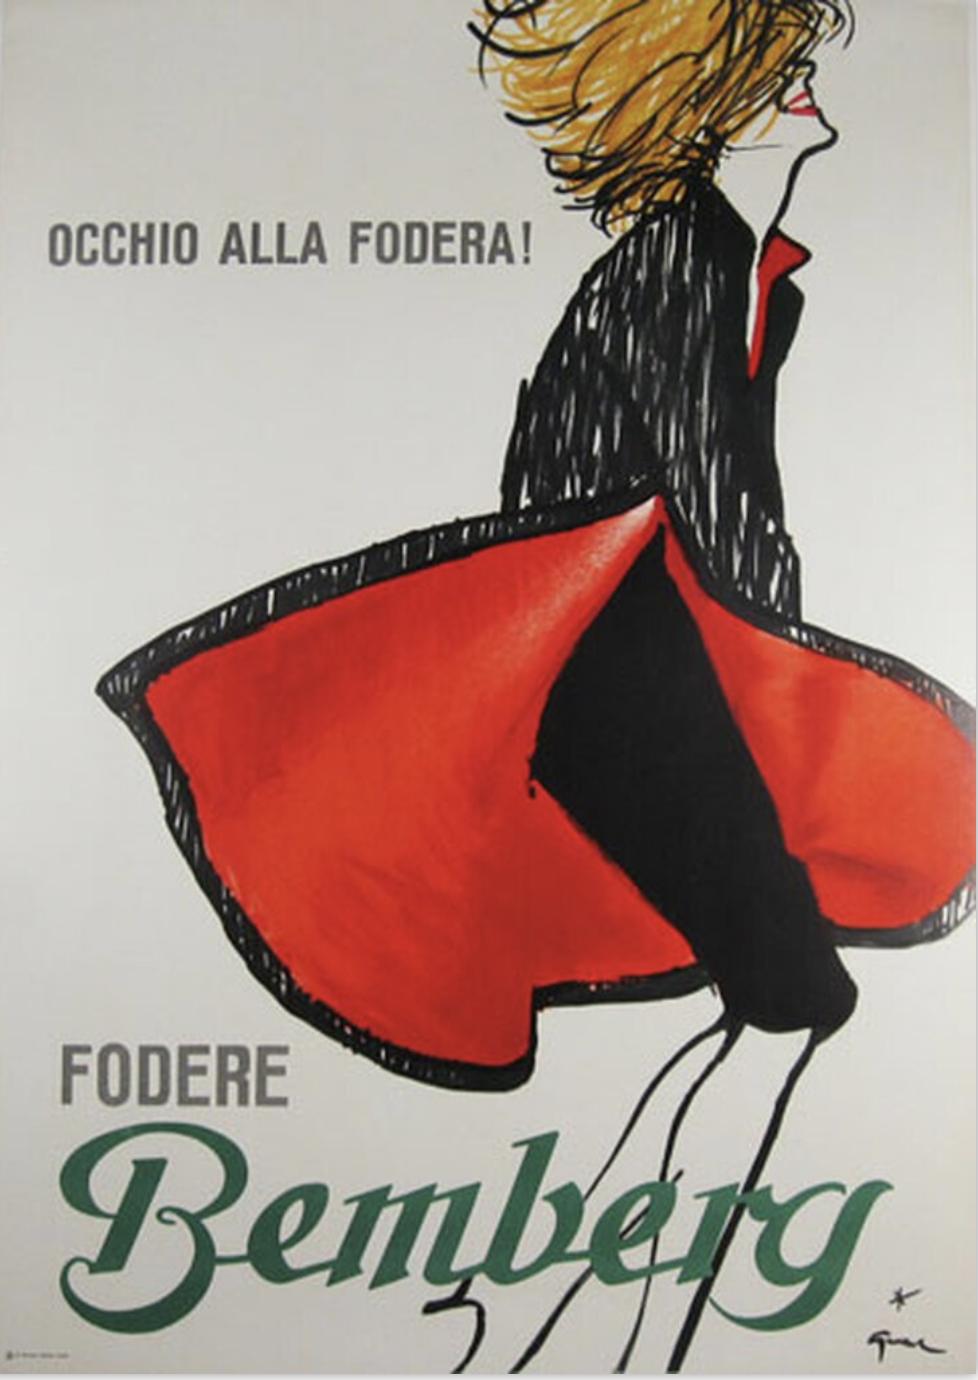 Fodere Bemberg by Gruau Original Vintage Poster